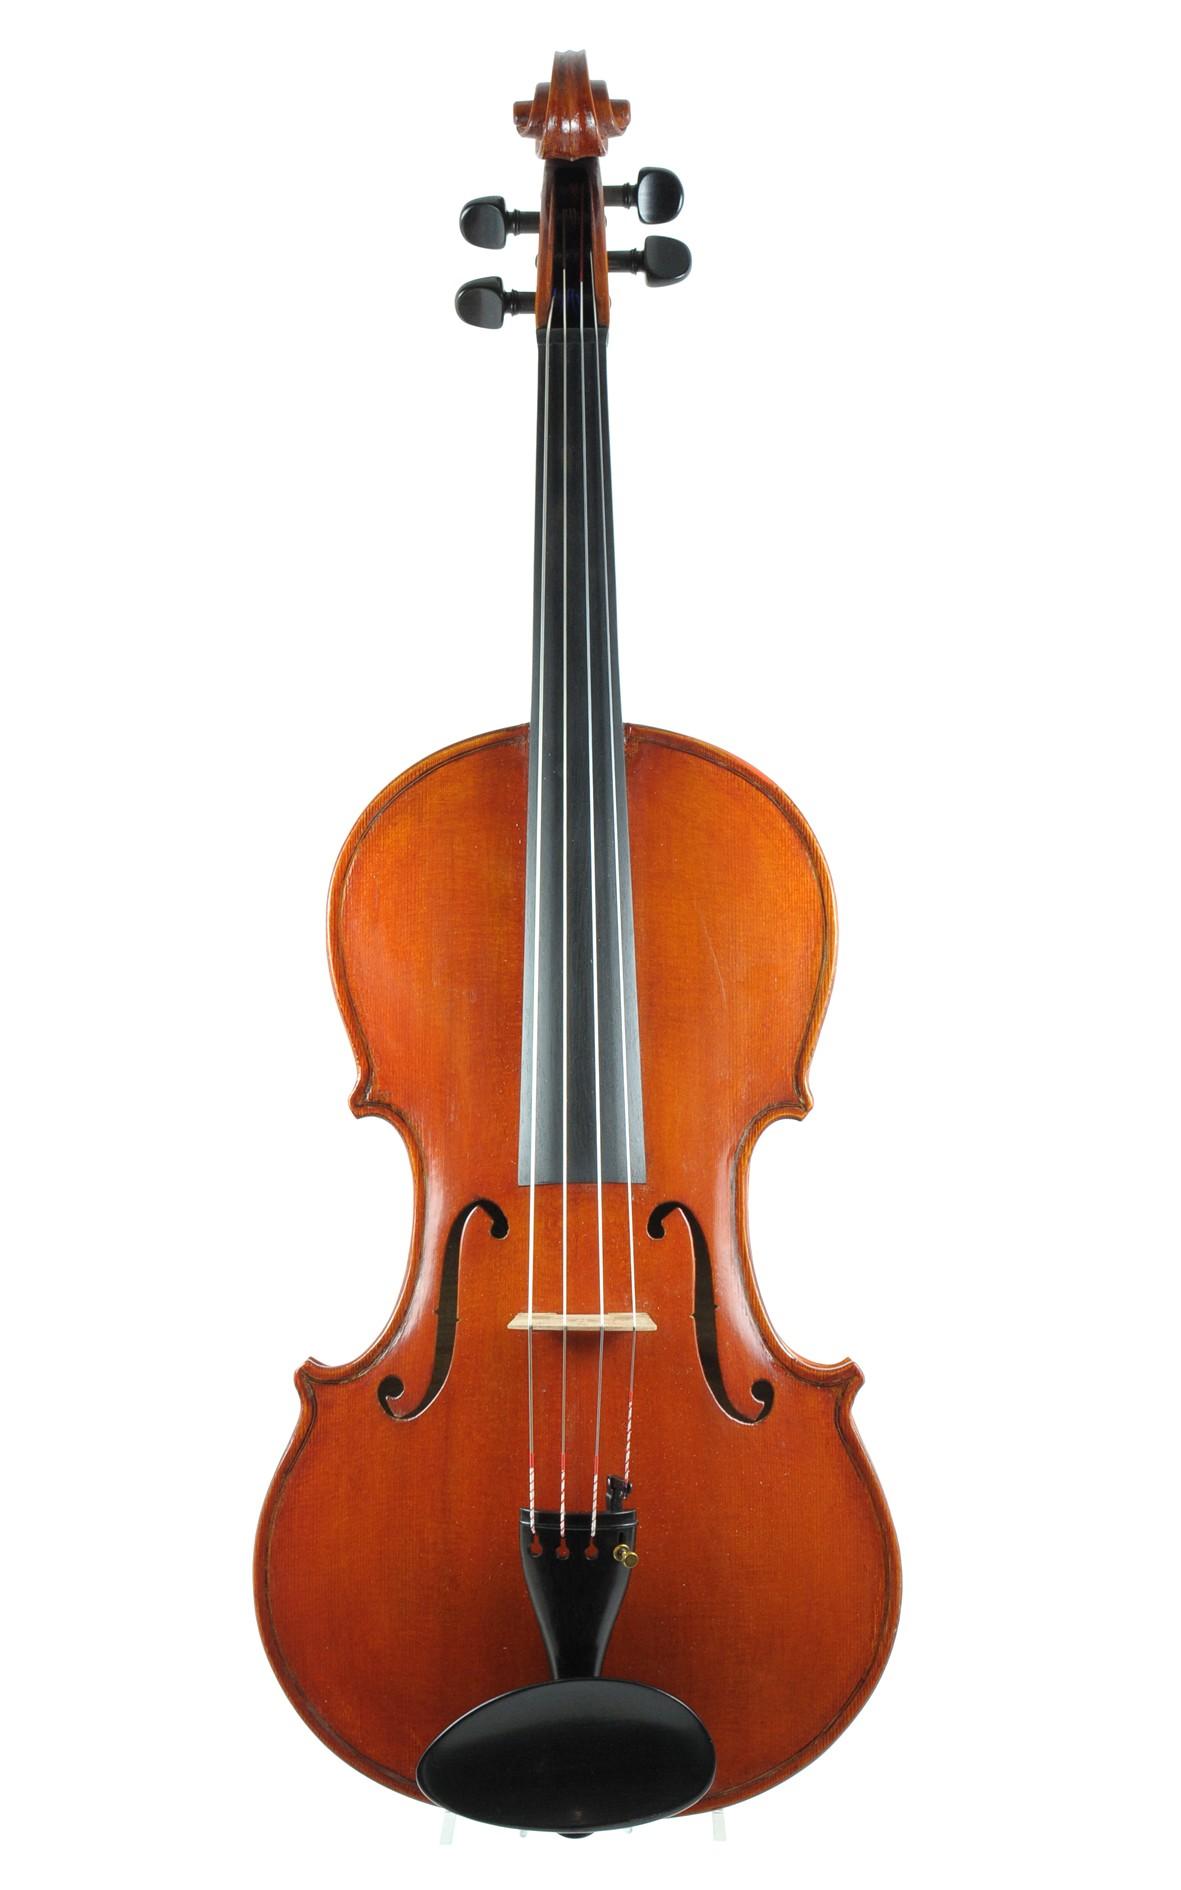 Yngve Akesson, viola 1983 - top